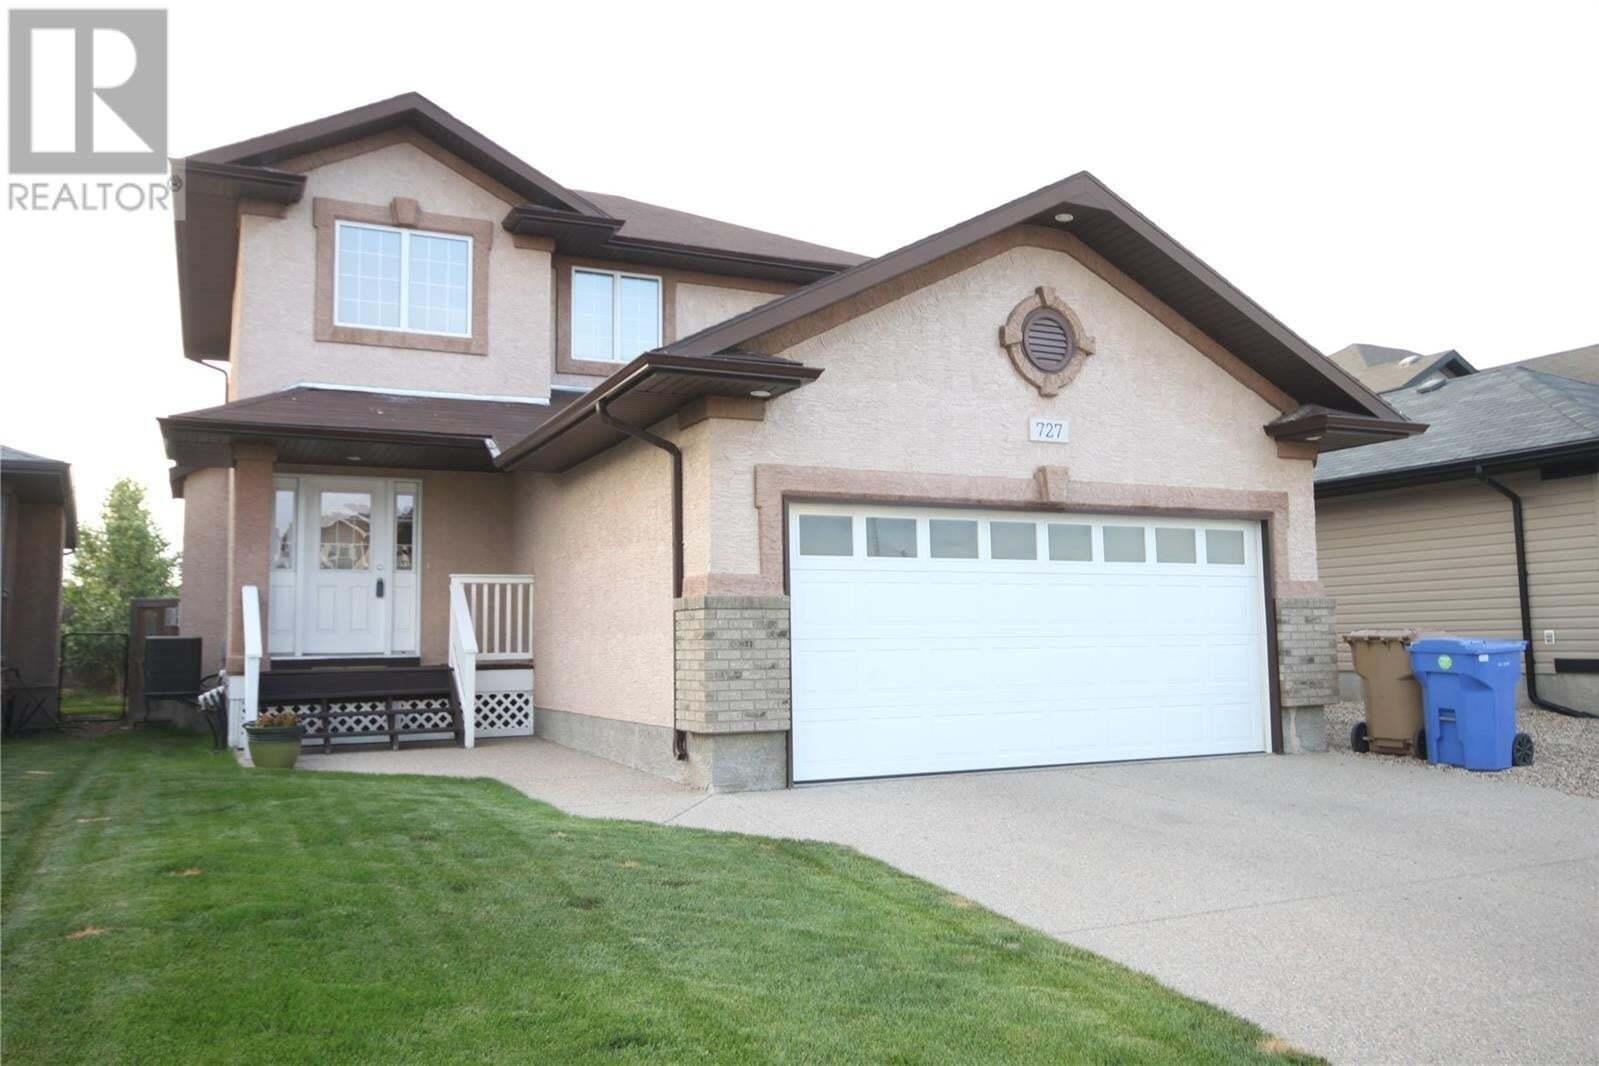 House for sale at 727 Bluebird Cres Regina Saskatchewan - MLS: SK818279